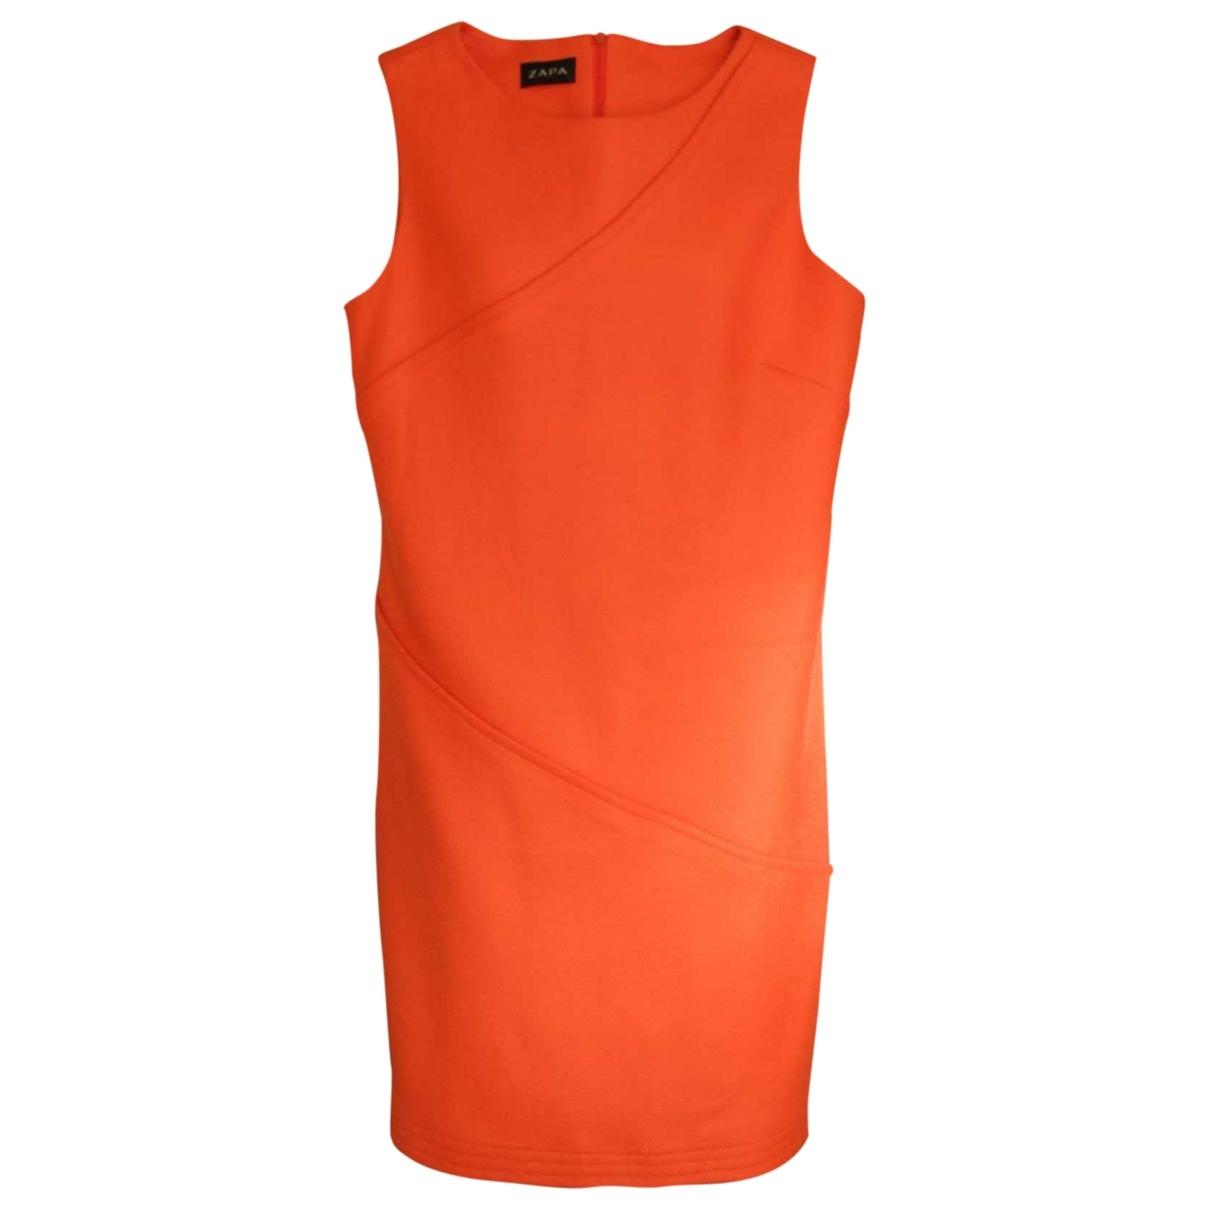 Zapa \N Kleid in  Orange Wolle